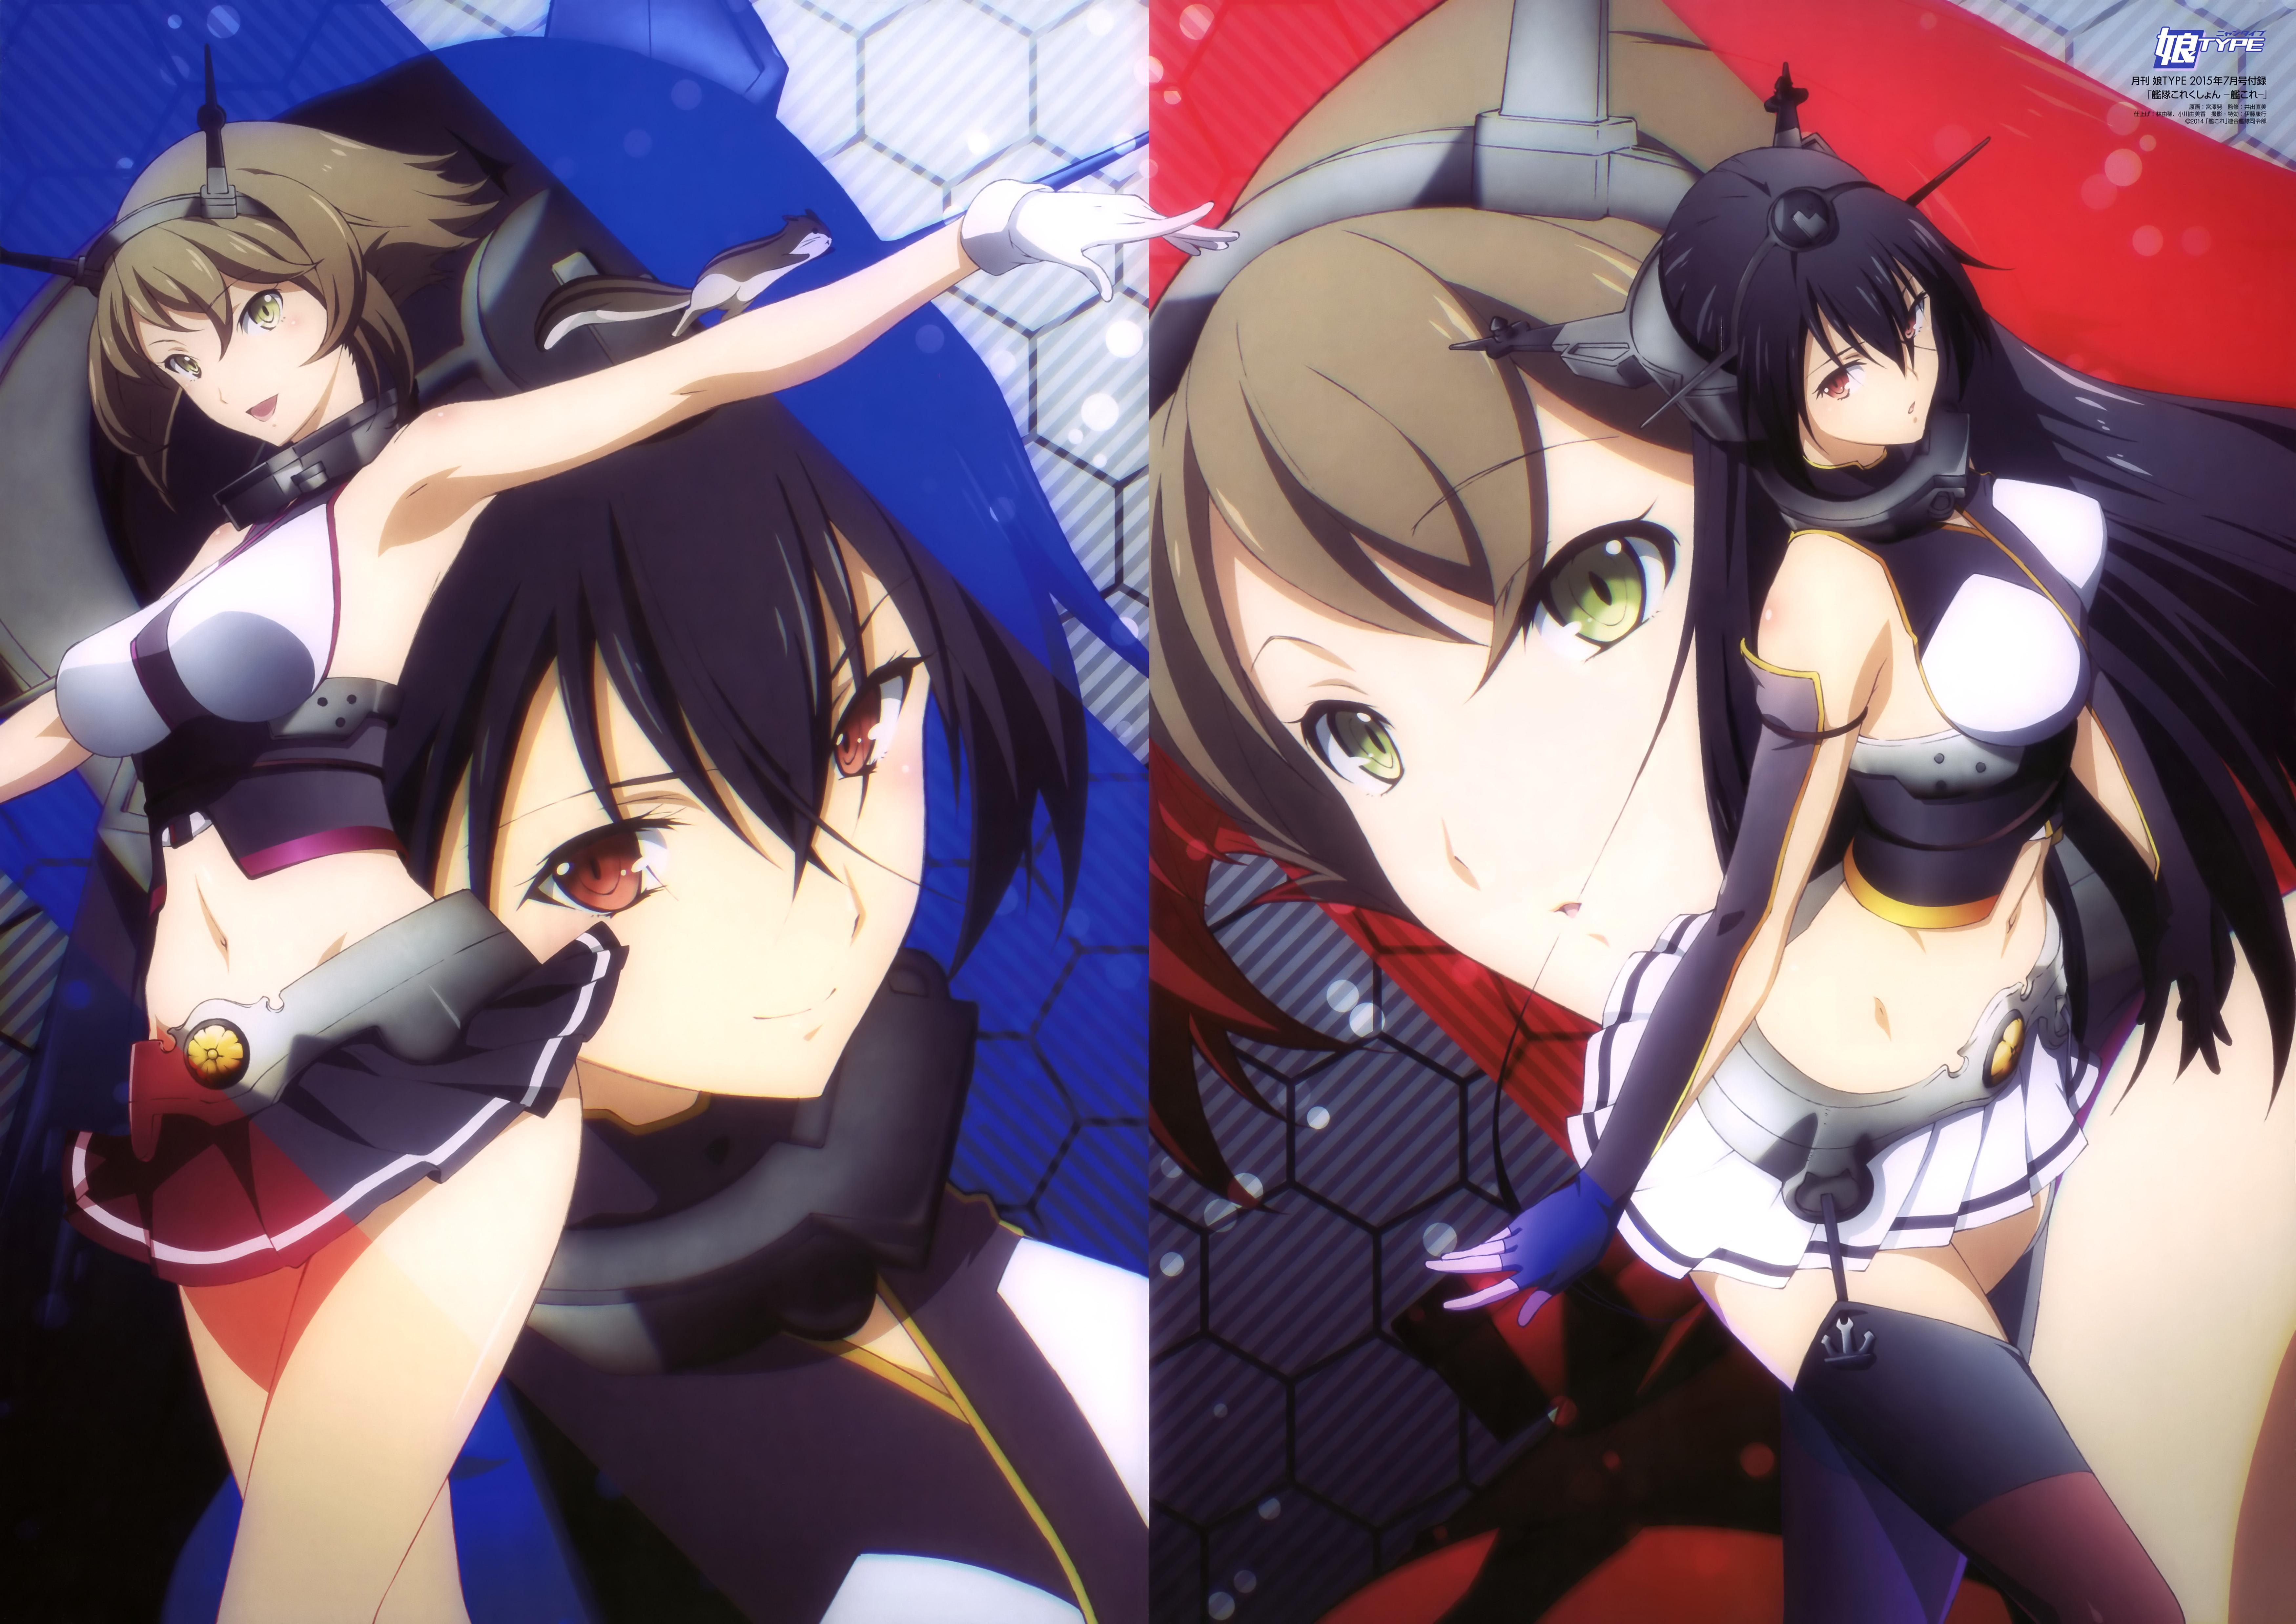 NyanType Magazine July 2015 anime posters kantai collection kancolle